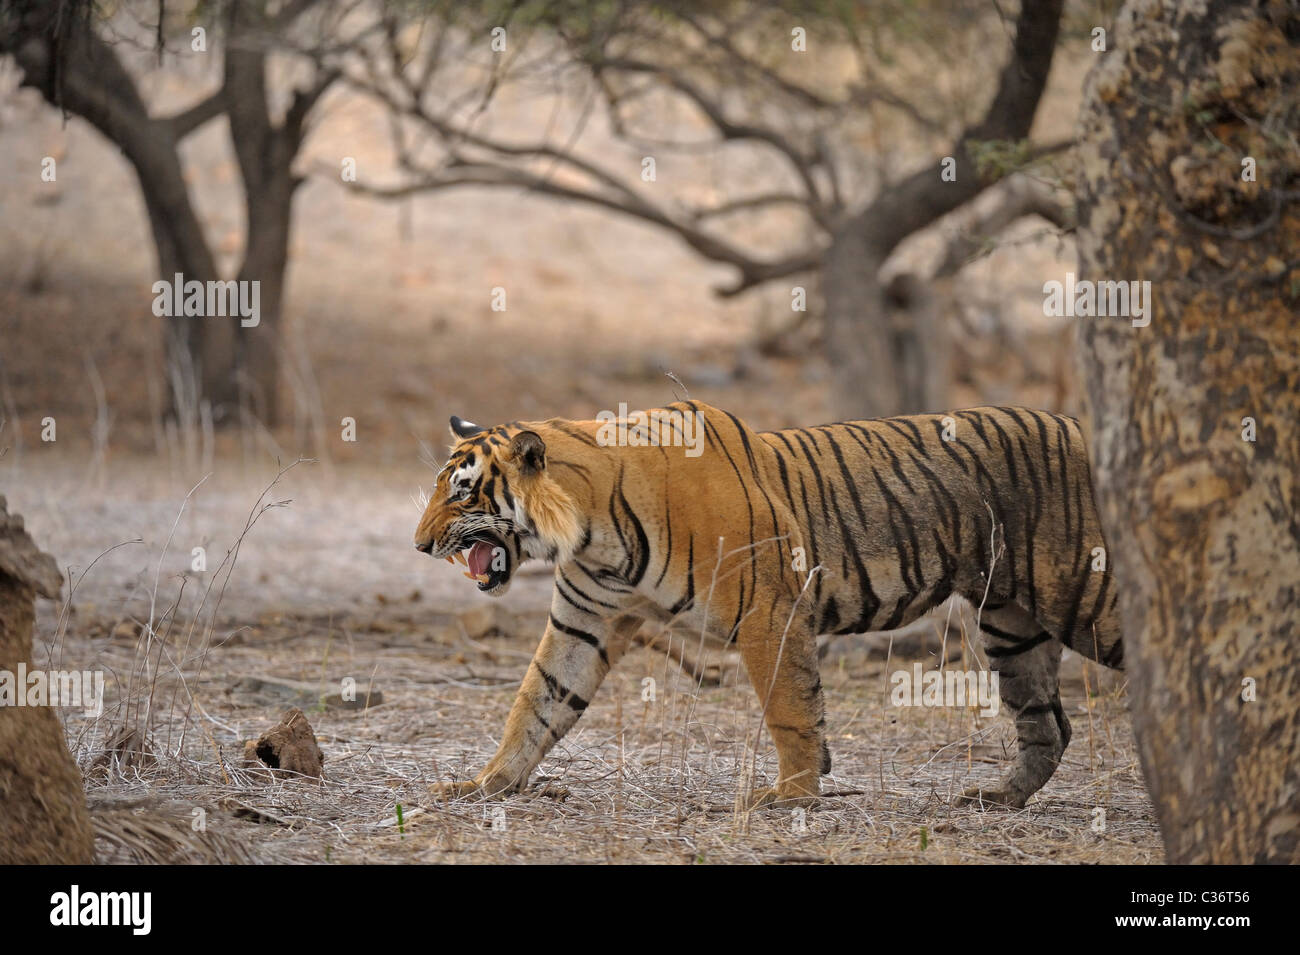 Tiger roaring in Ranthambhore national park, - Stock Image